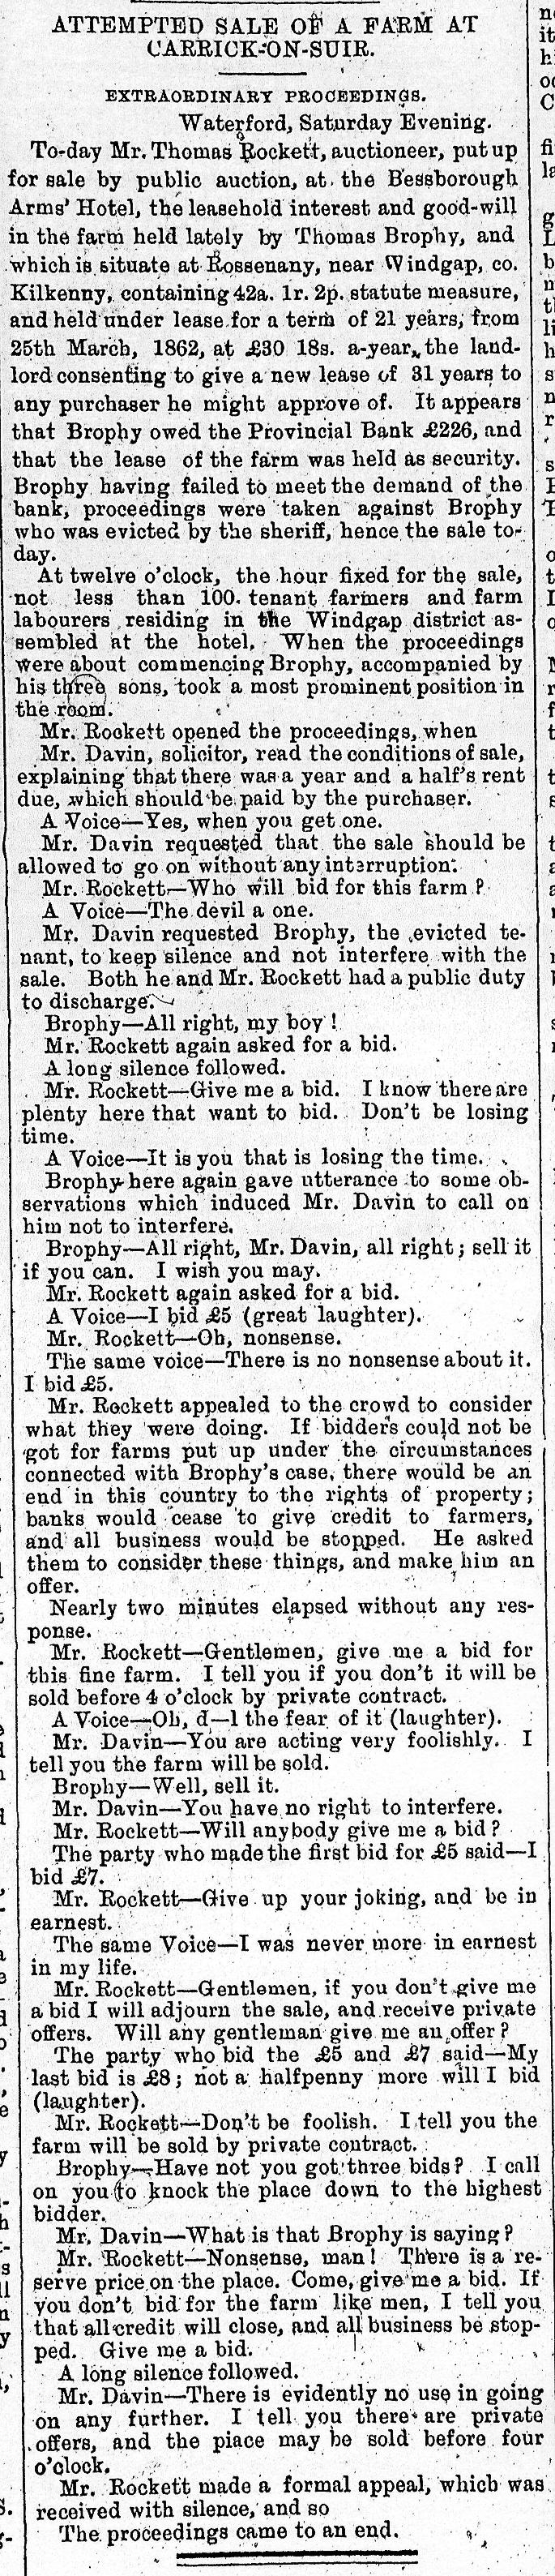 tfp-14-10-1880-carrick-sale